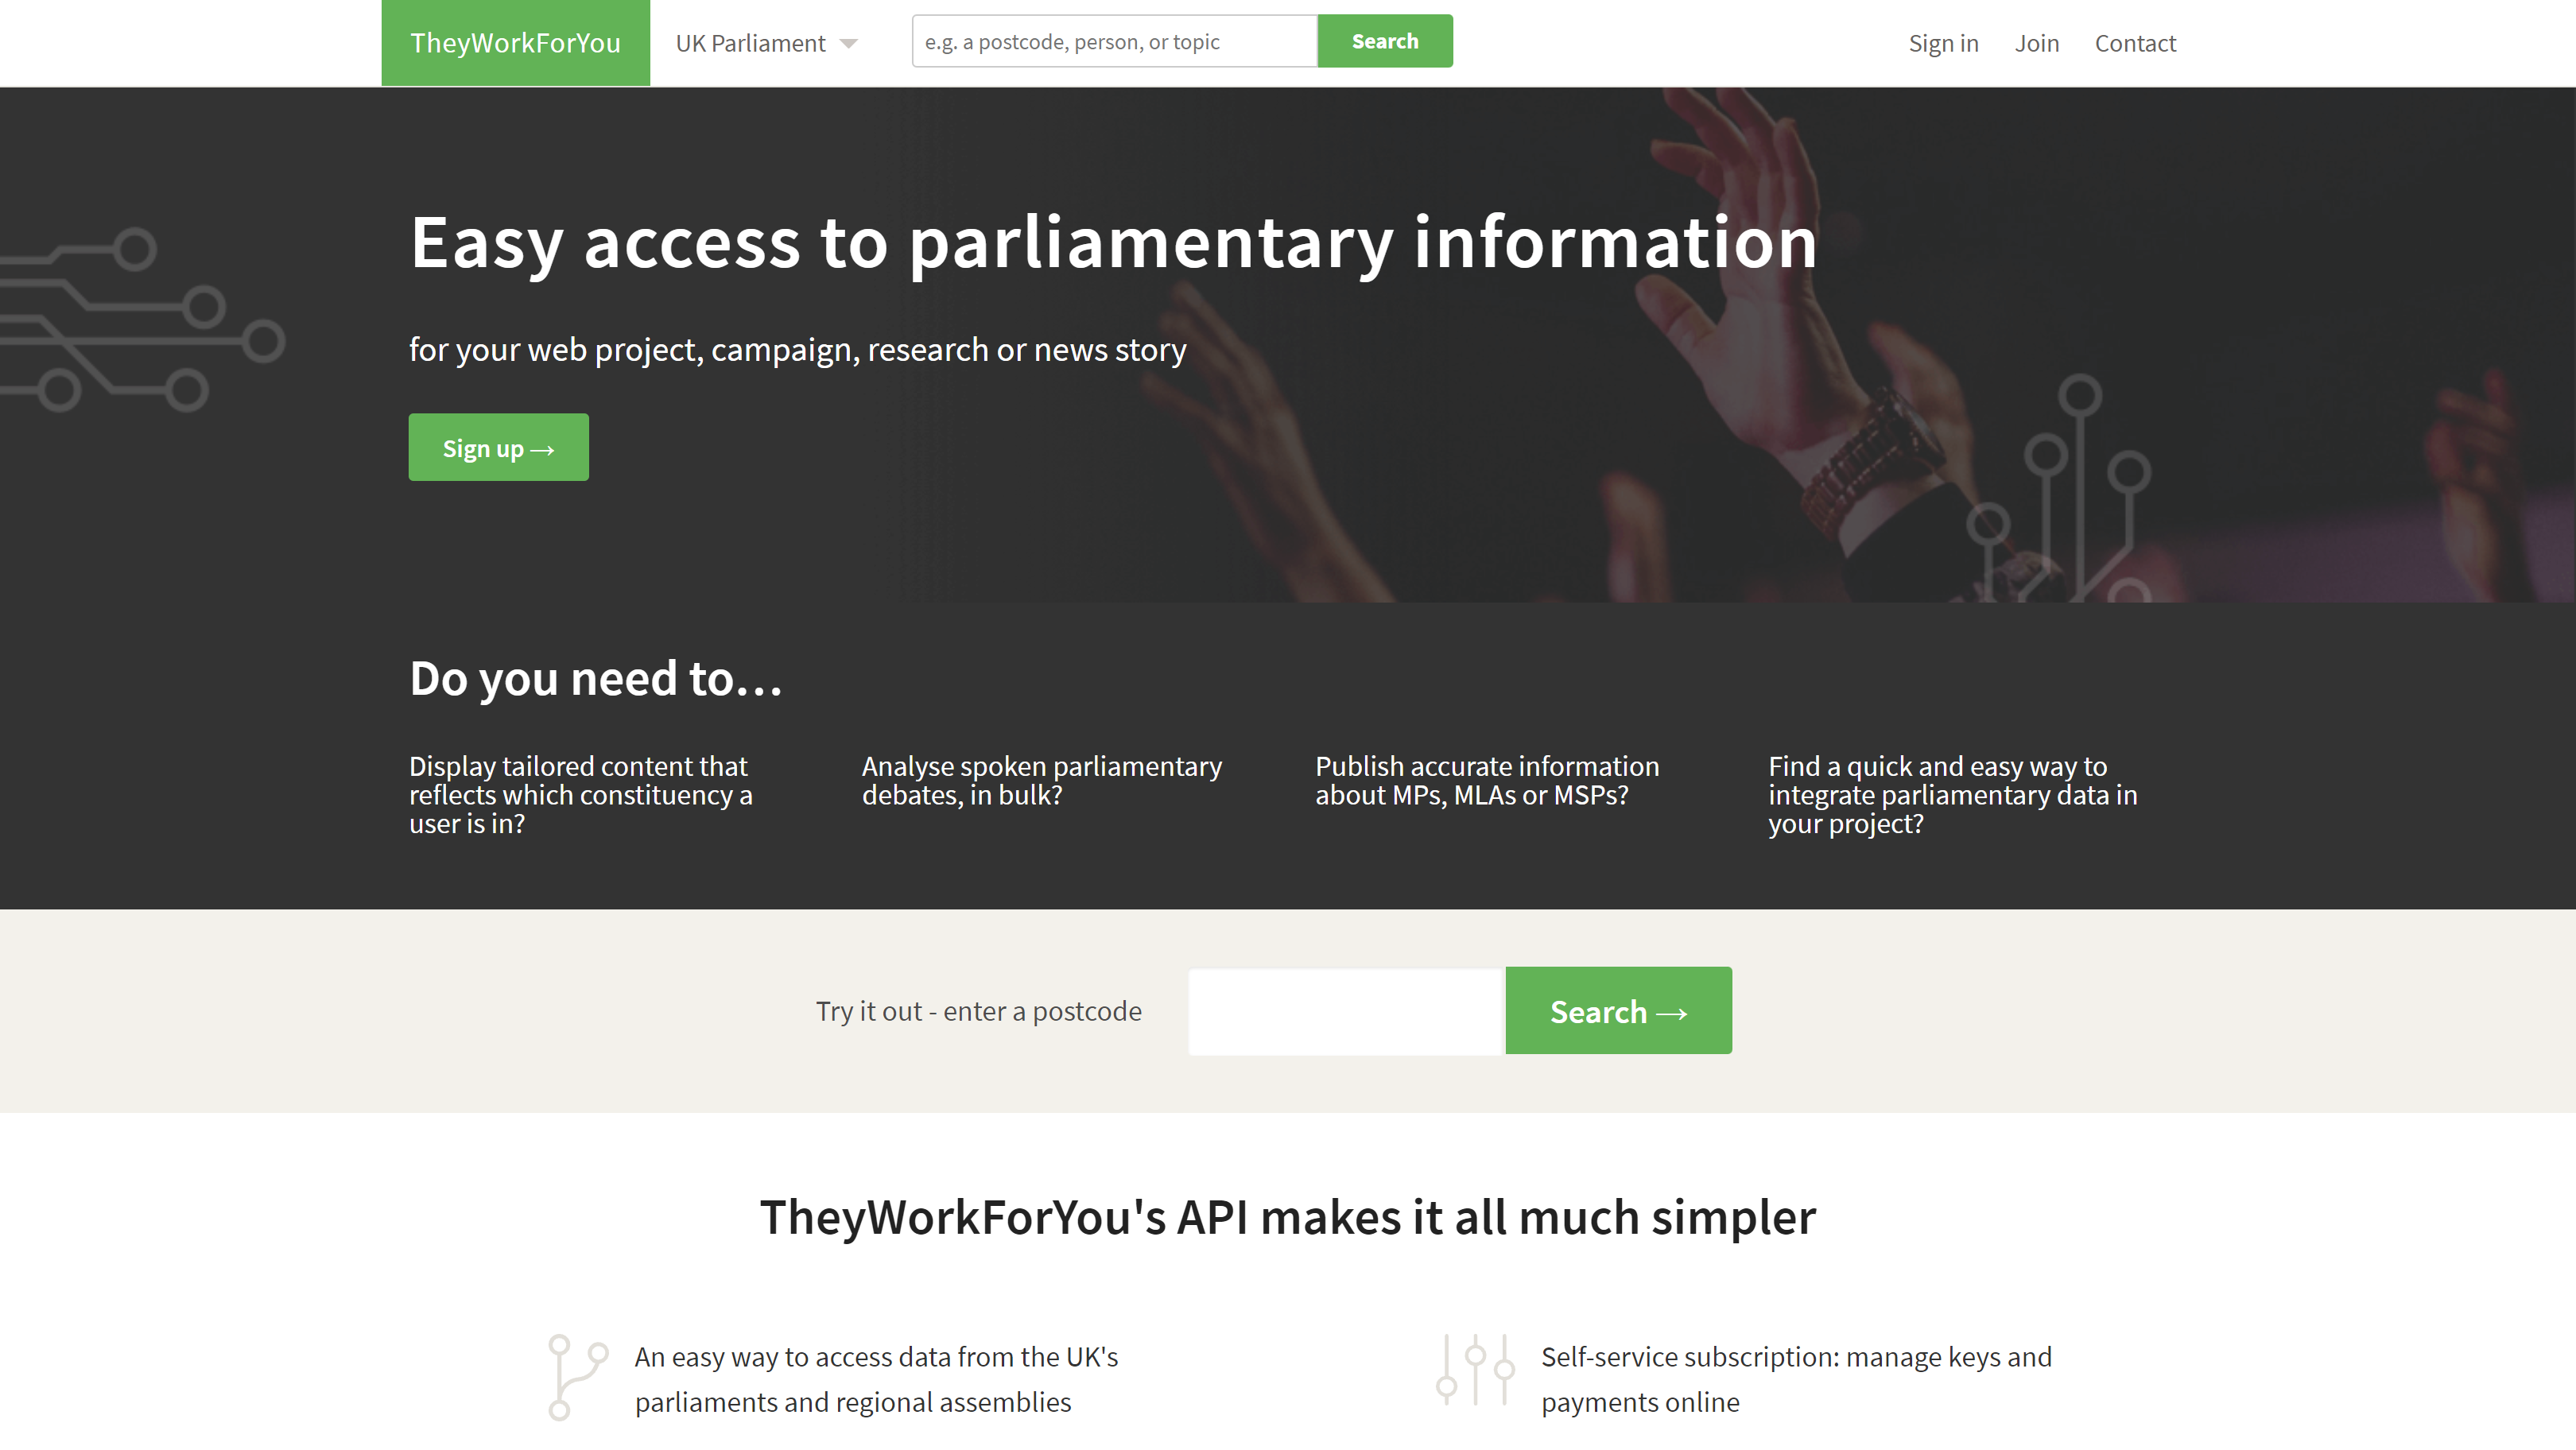 The TheyWorkForYou API, homepage